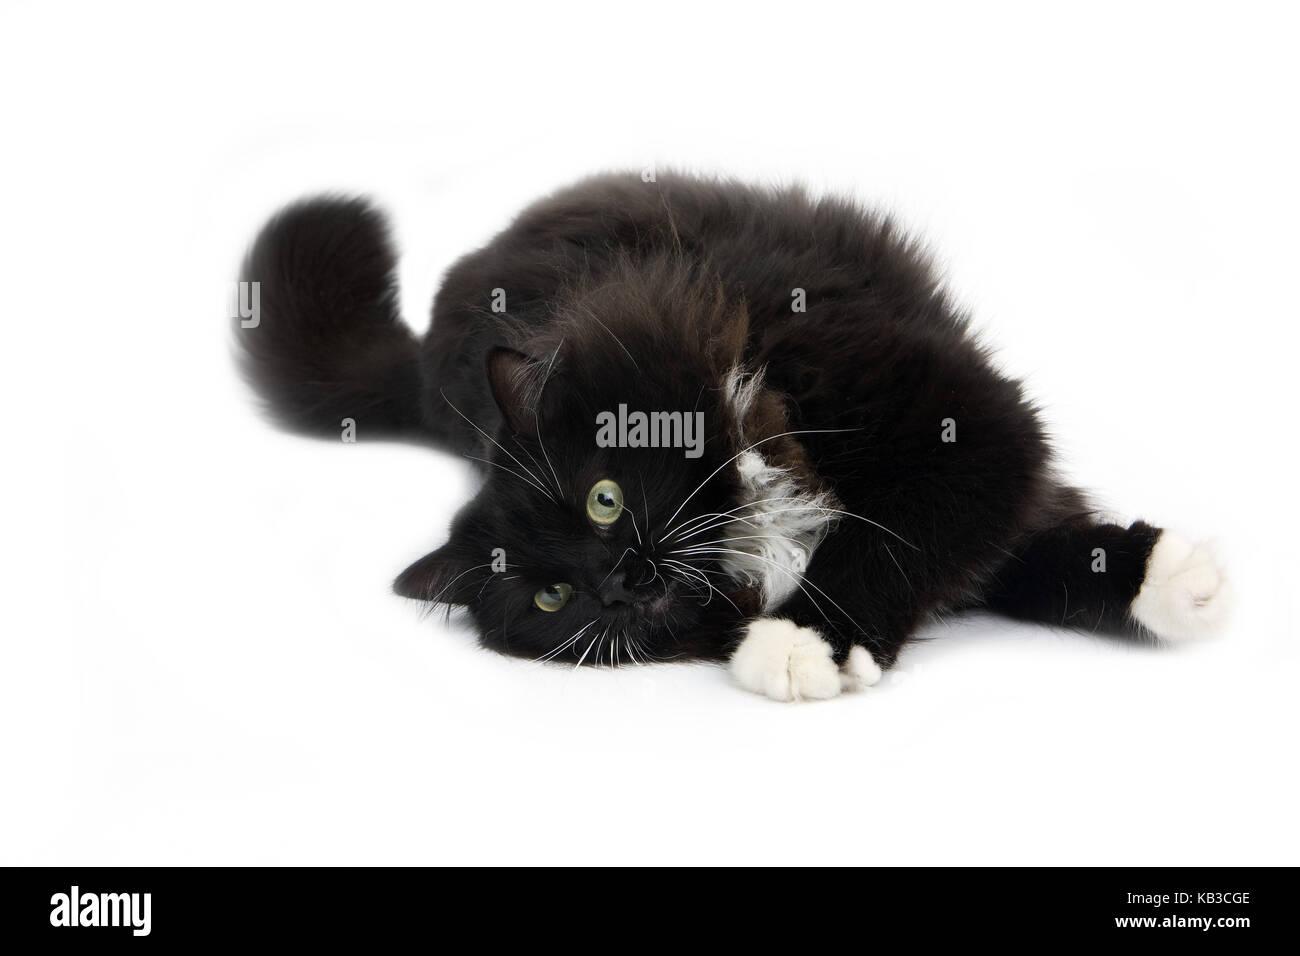 cat 6 max length